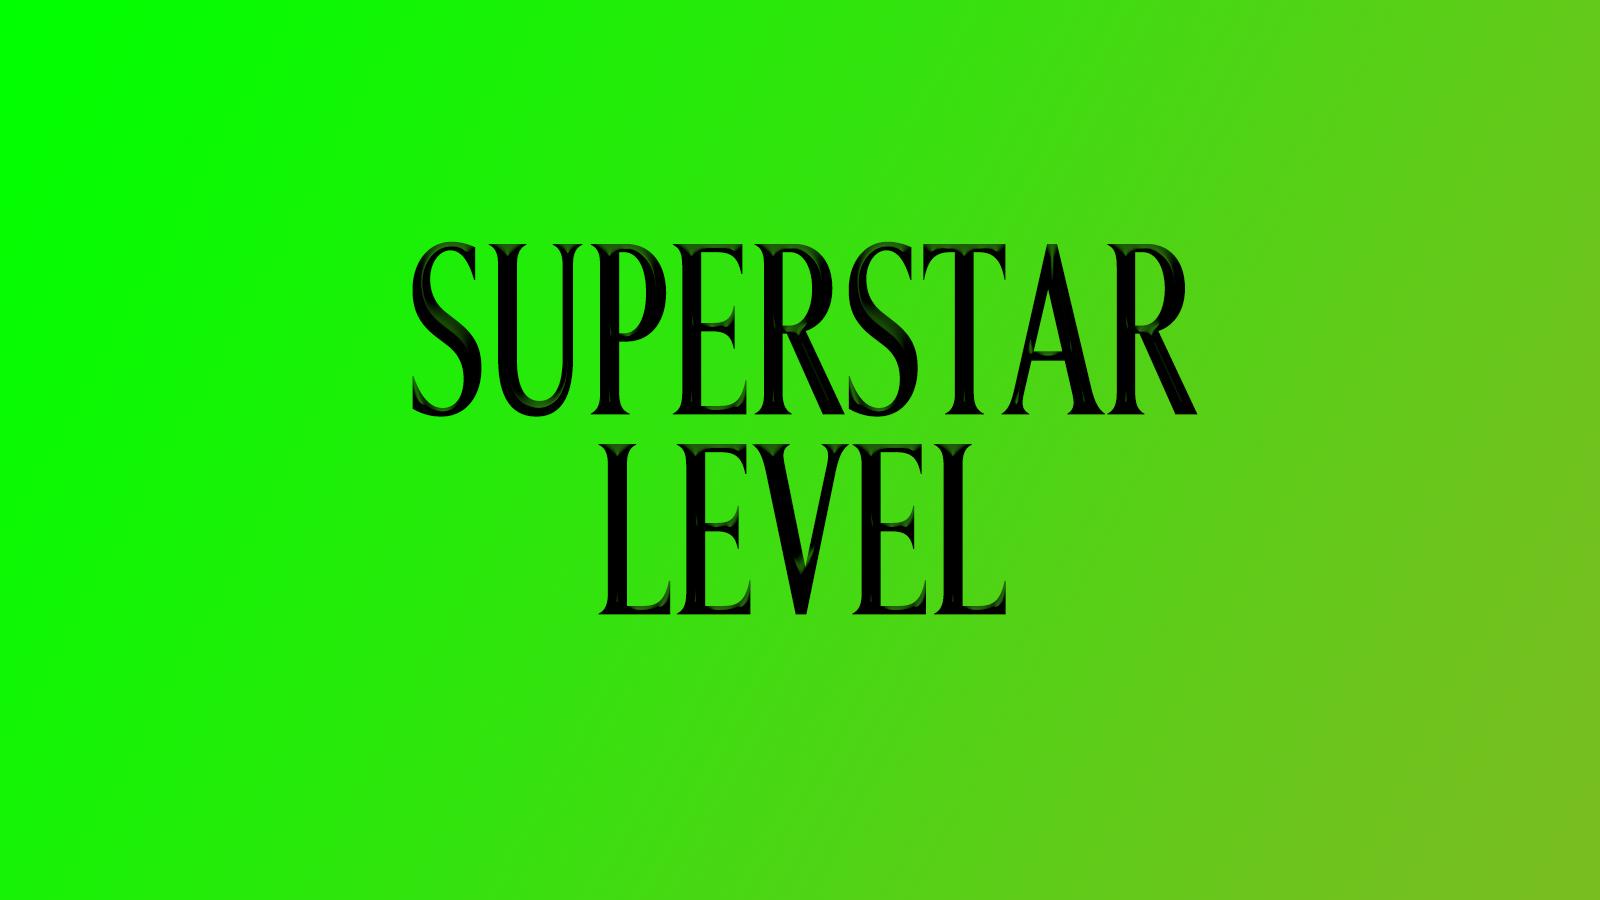 SUPERSTAR LEVEL